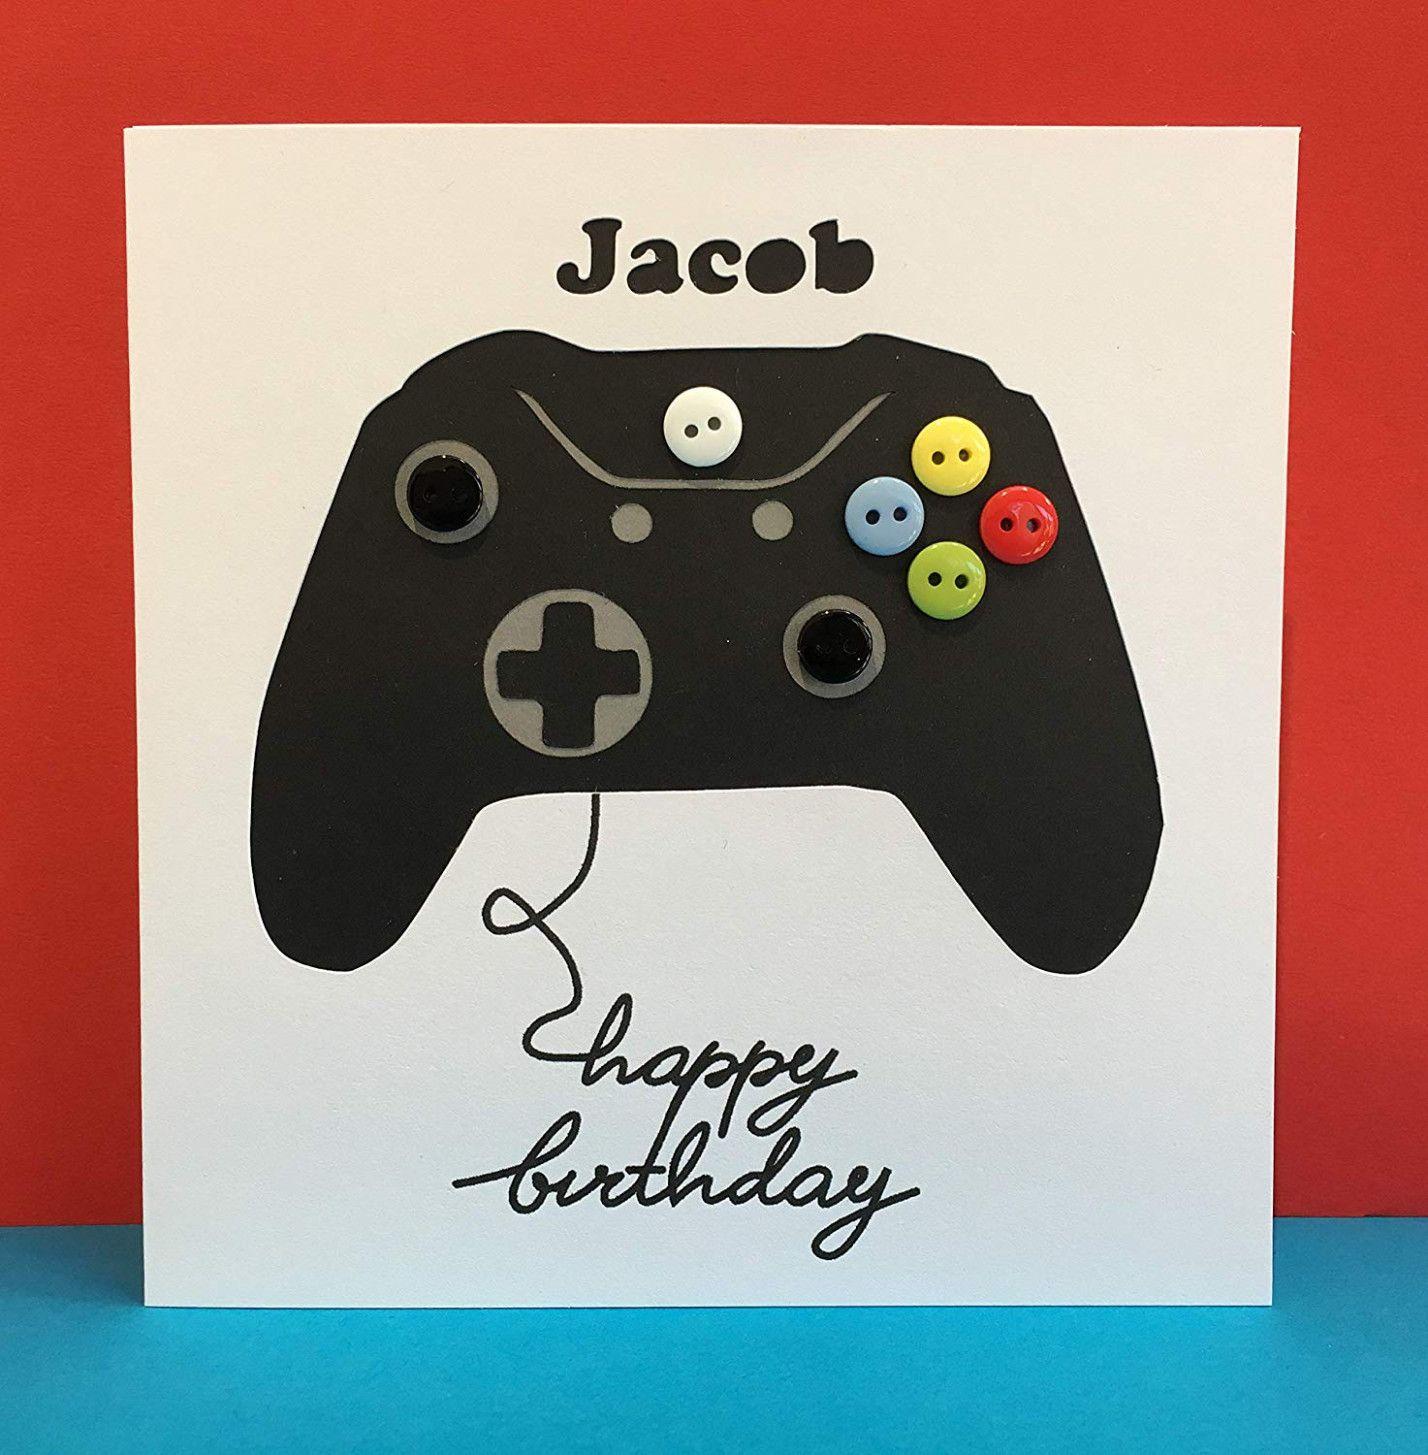 8 Best Xbox Controller Birthday Card in 8  First birthday